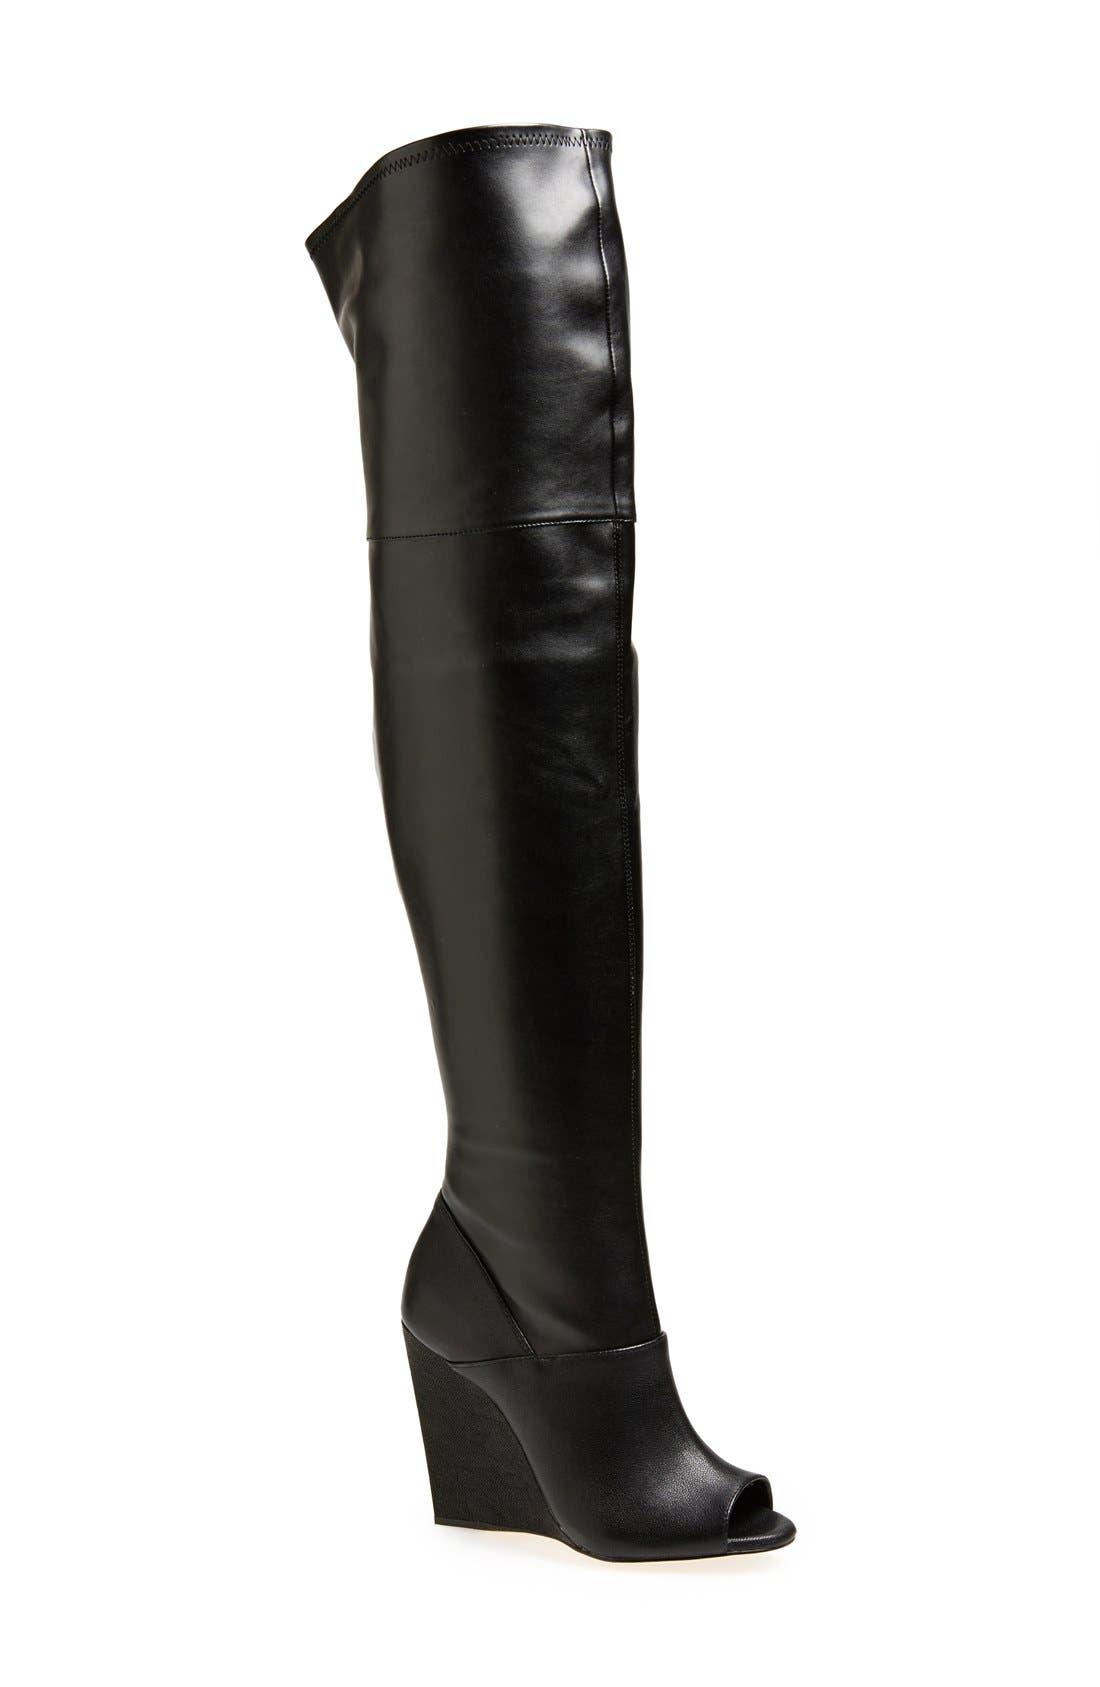 BCBGMAXAZRIA 'Deanna' Over the Knee Leather Peep Toe Boot, Main, color, 001